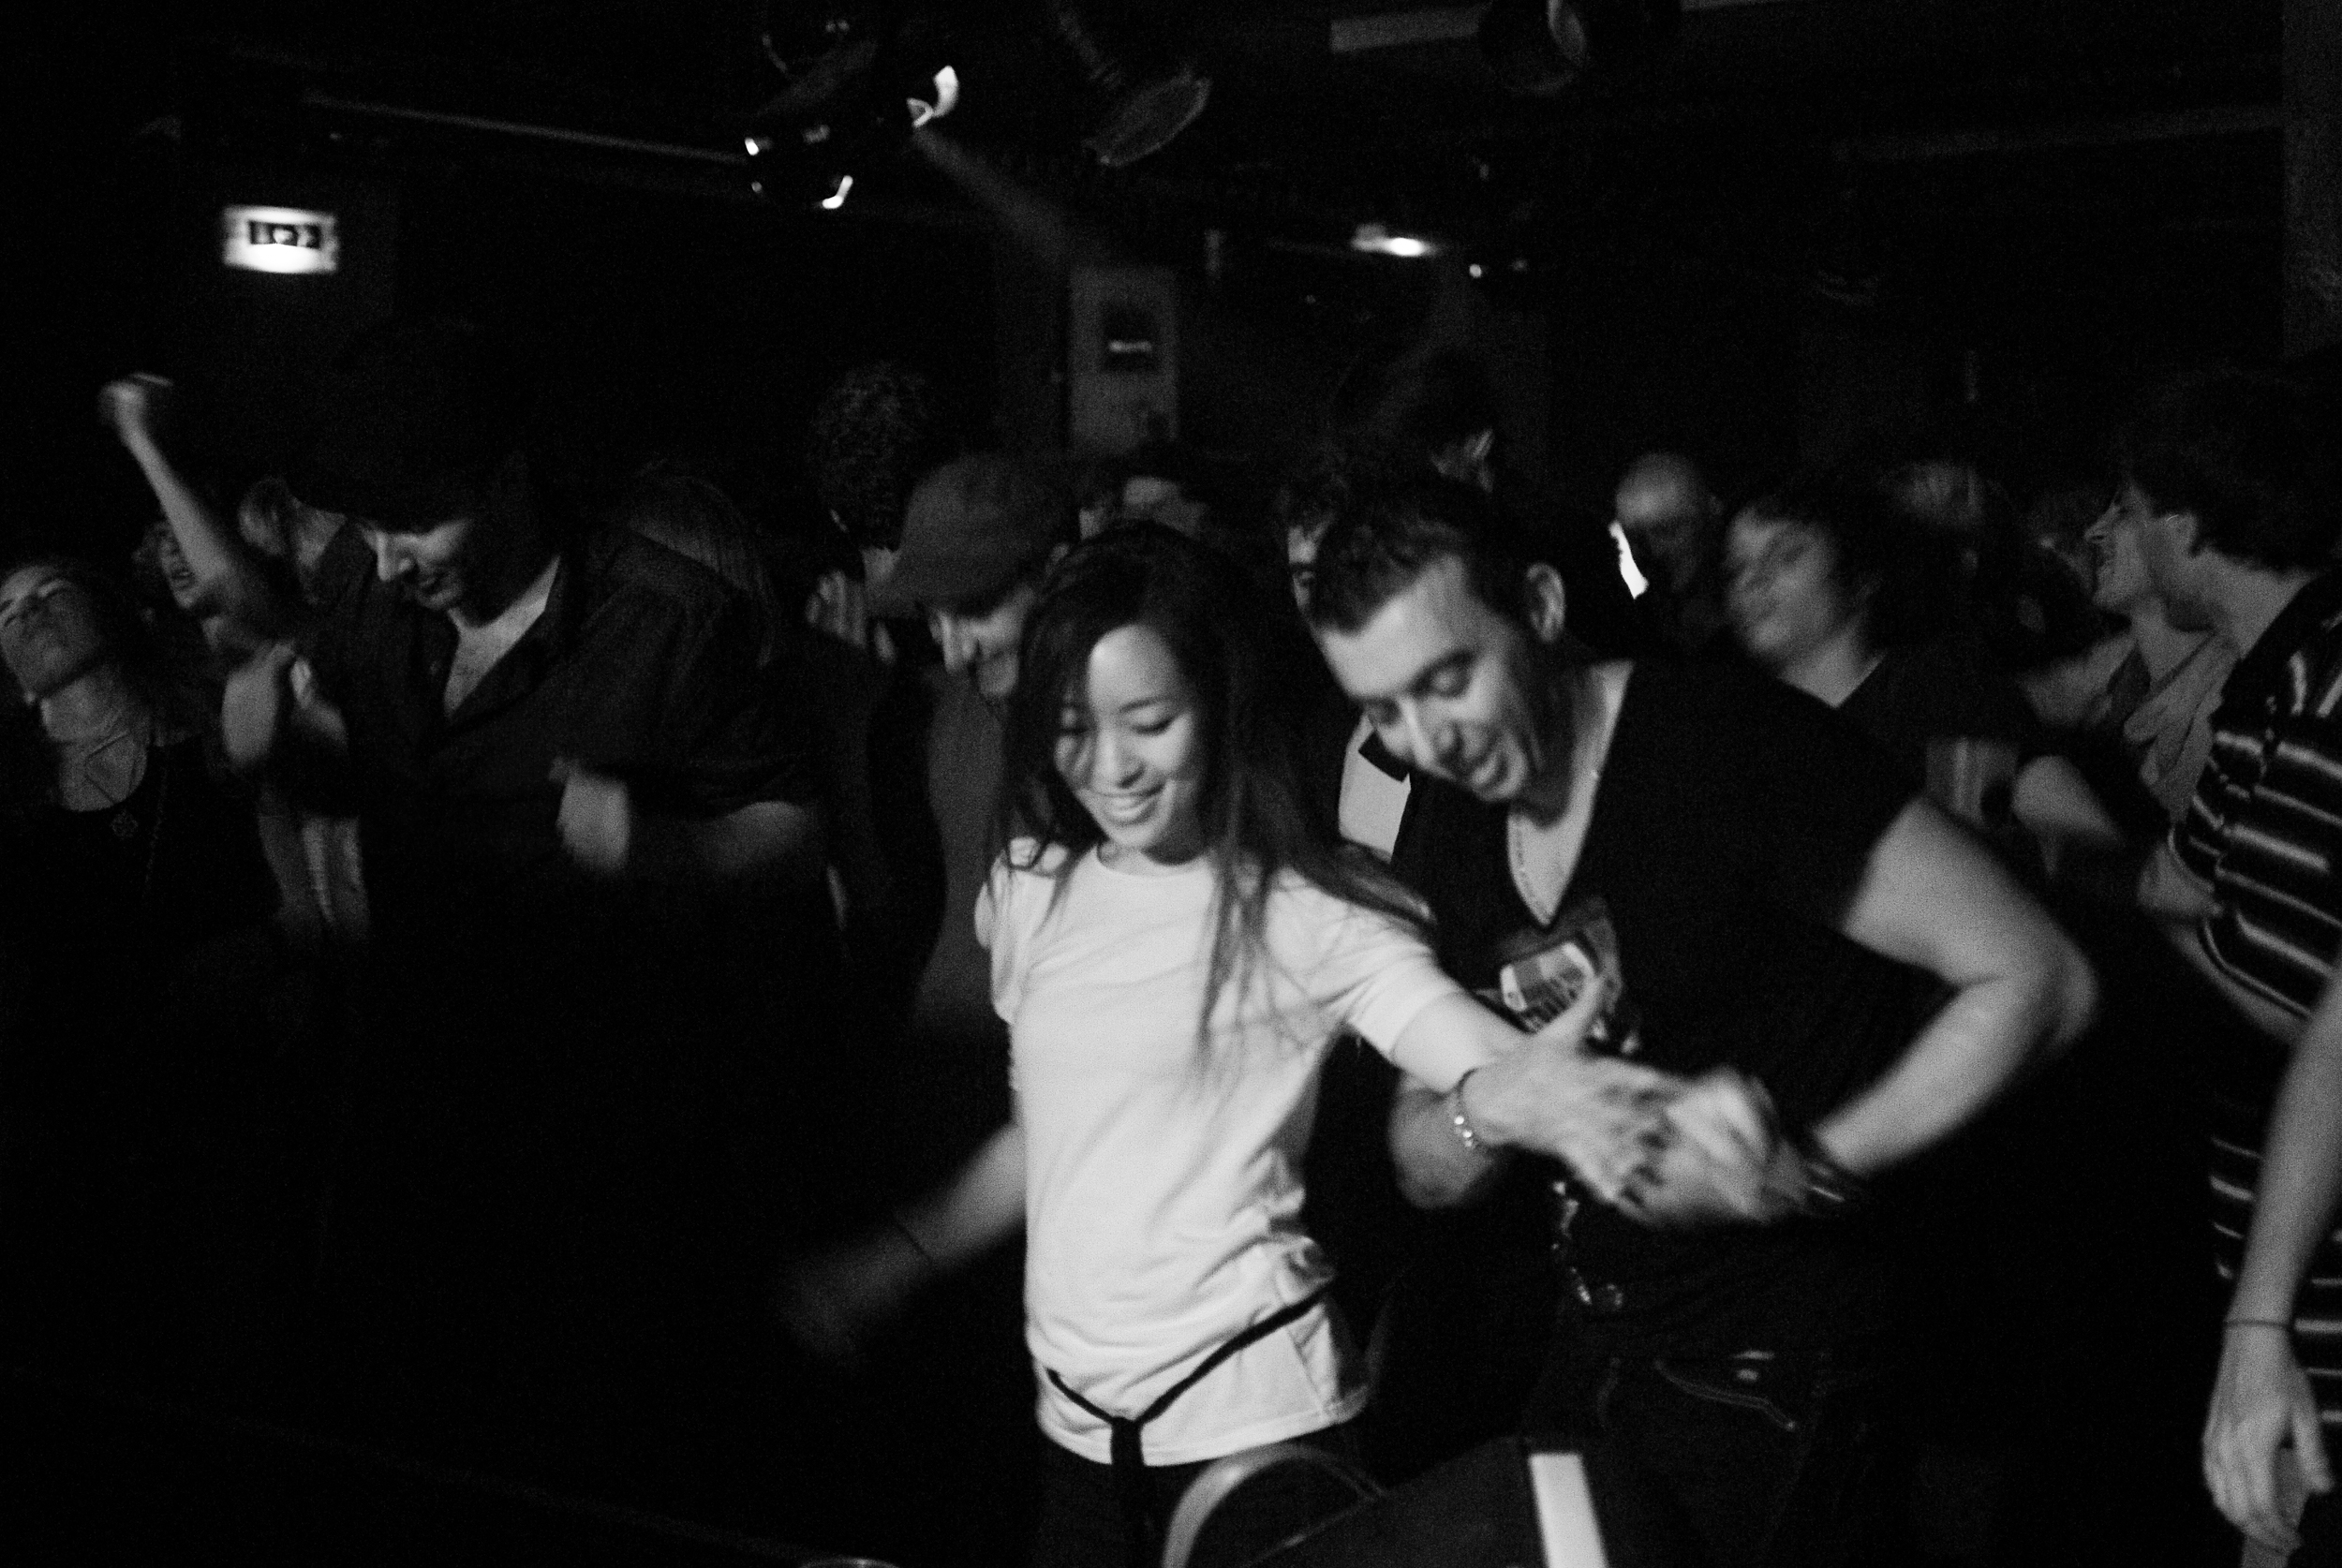 Dancers, Glazart, Paris